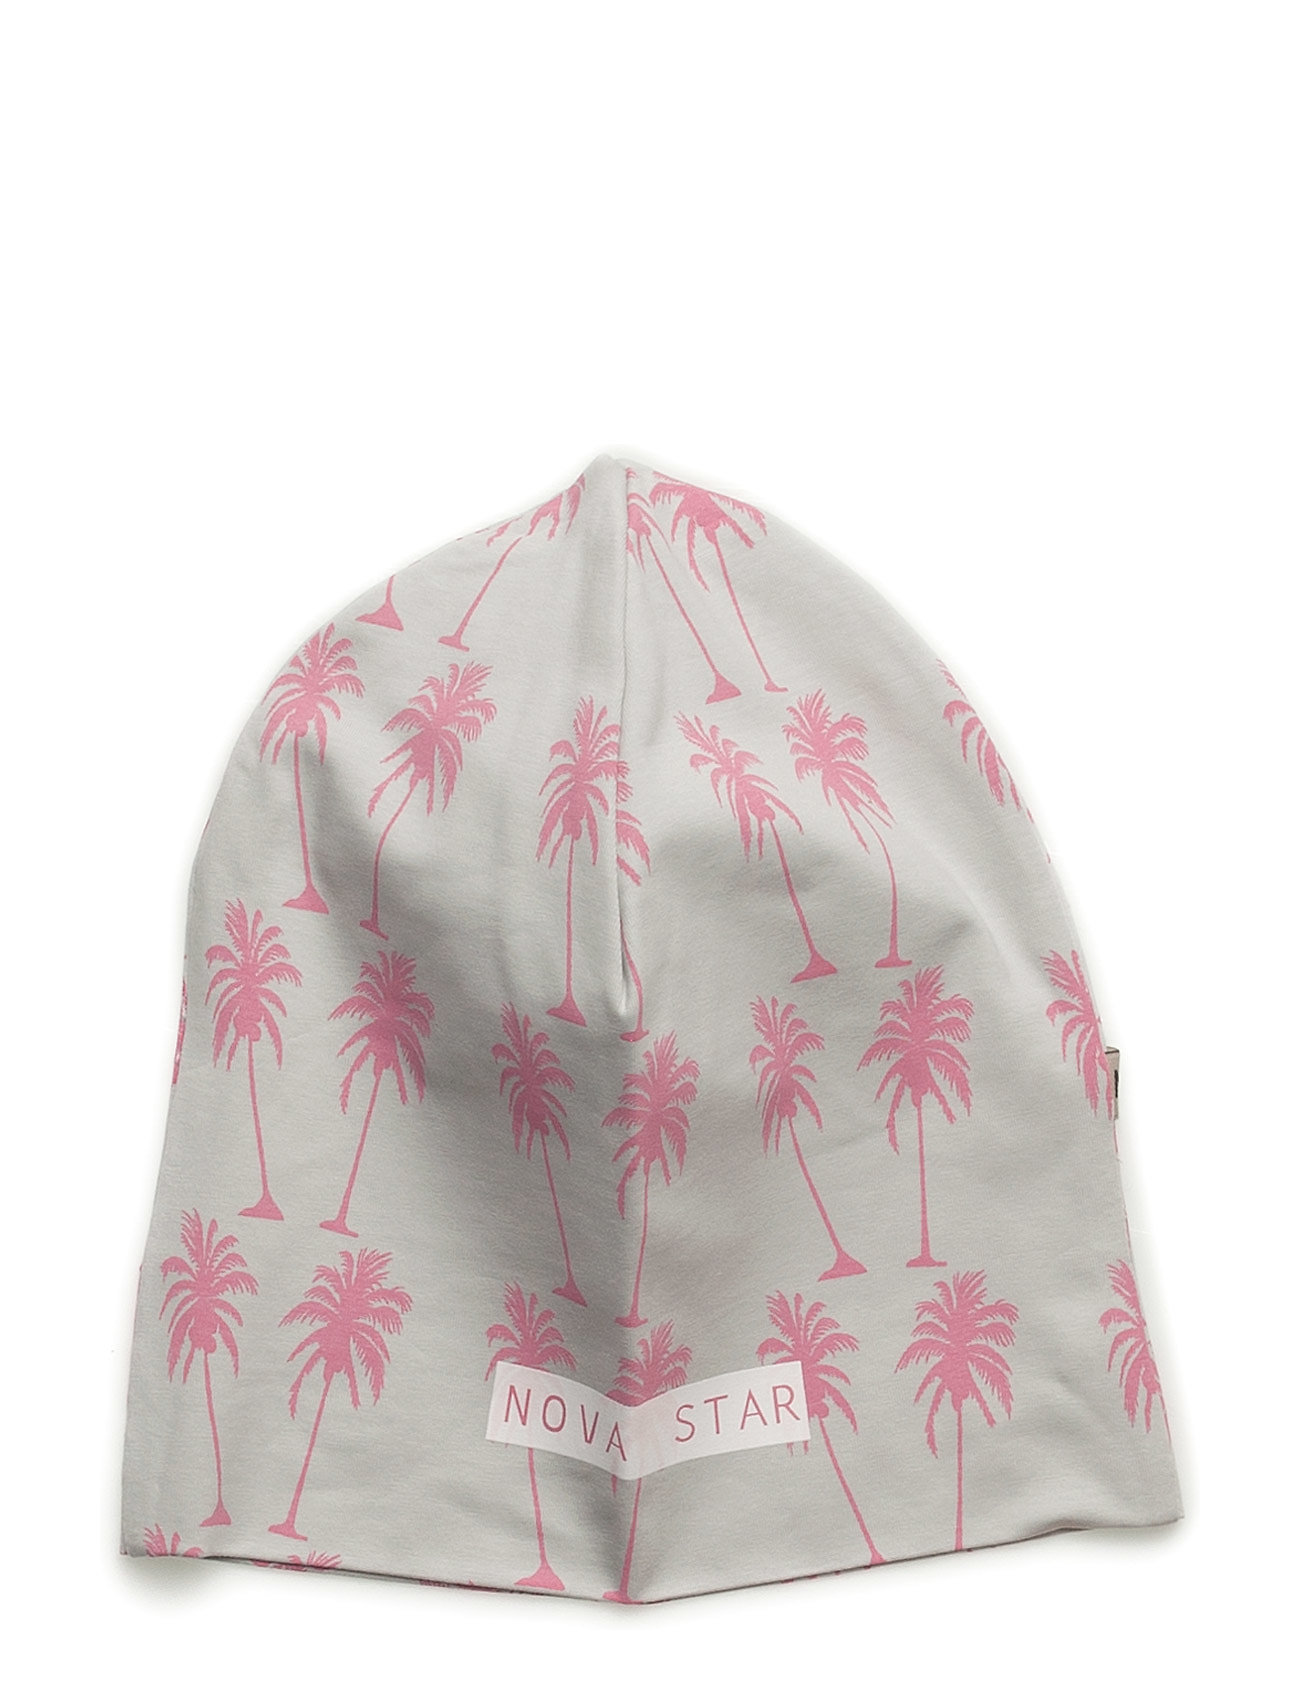 Beanie Pink Palms NOVA STAR Overtøj til Piger i Grå